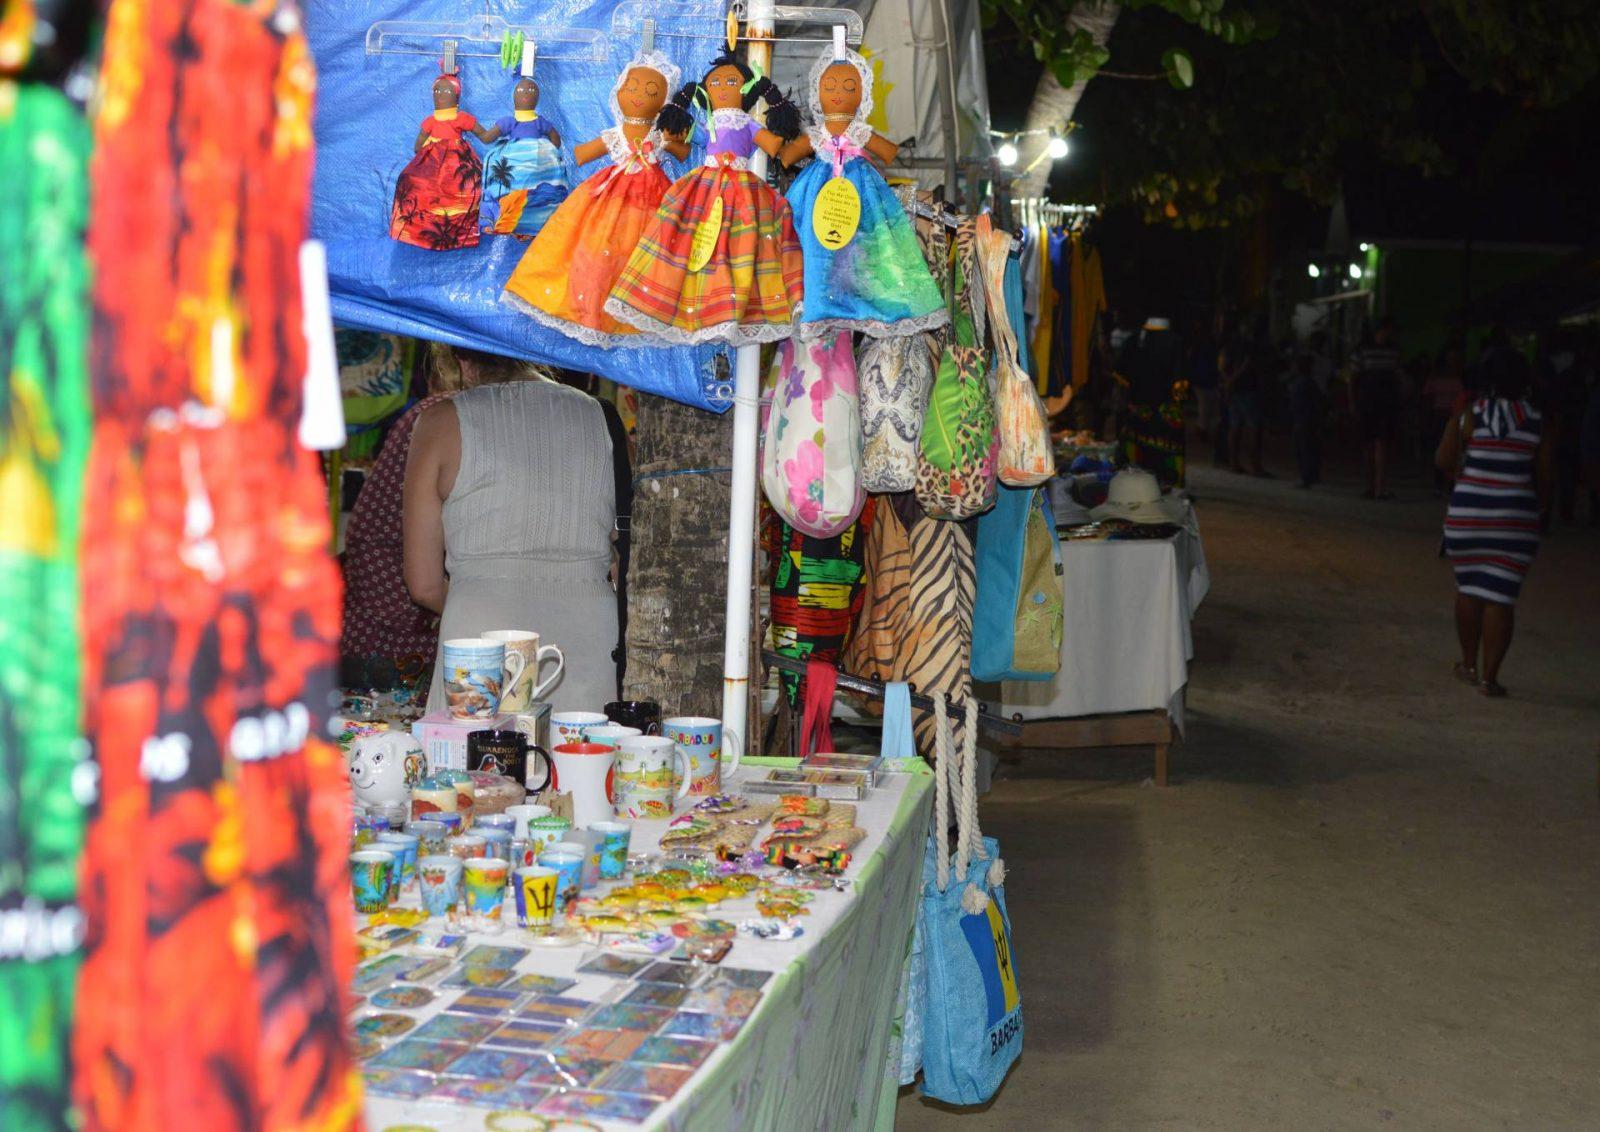 Oistins fish fry, market stall